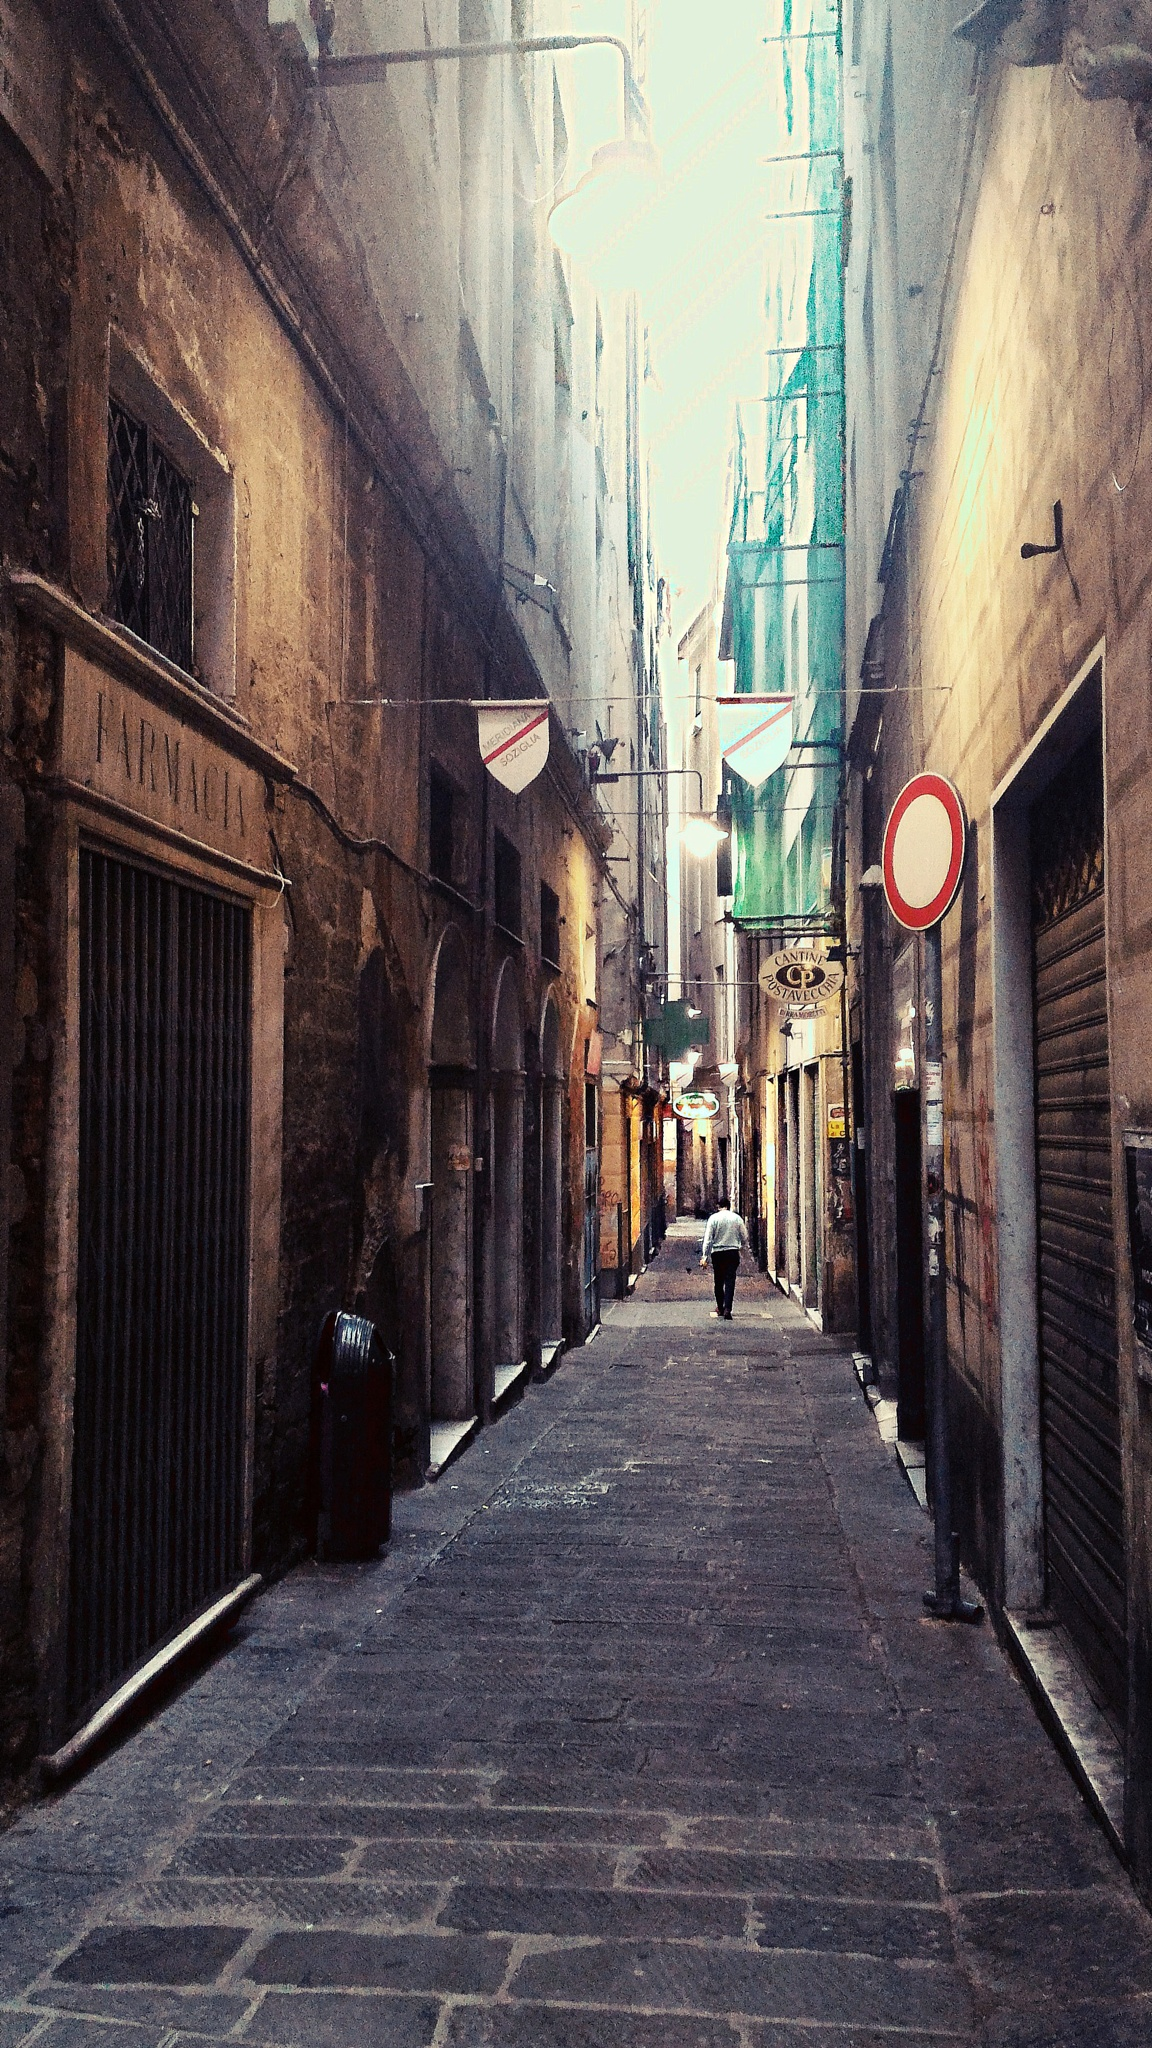 Genoa's alleys by Mistral Moratti